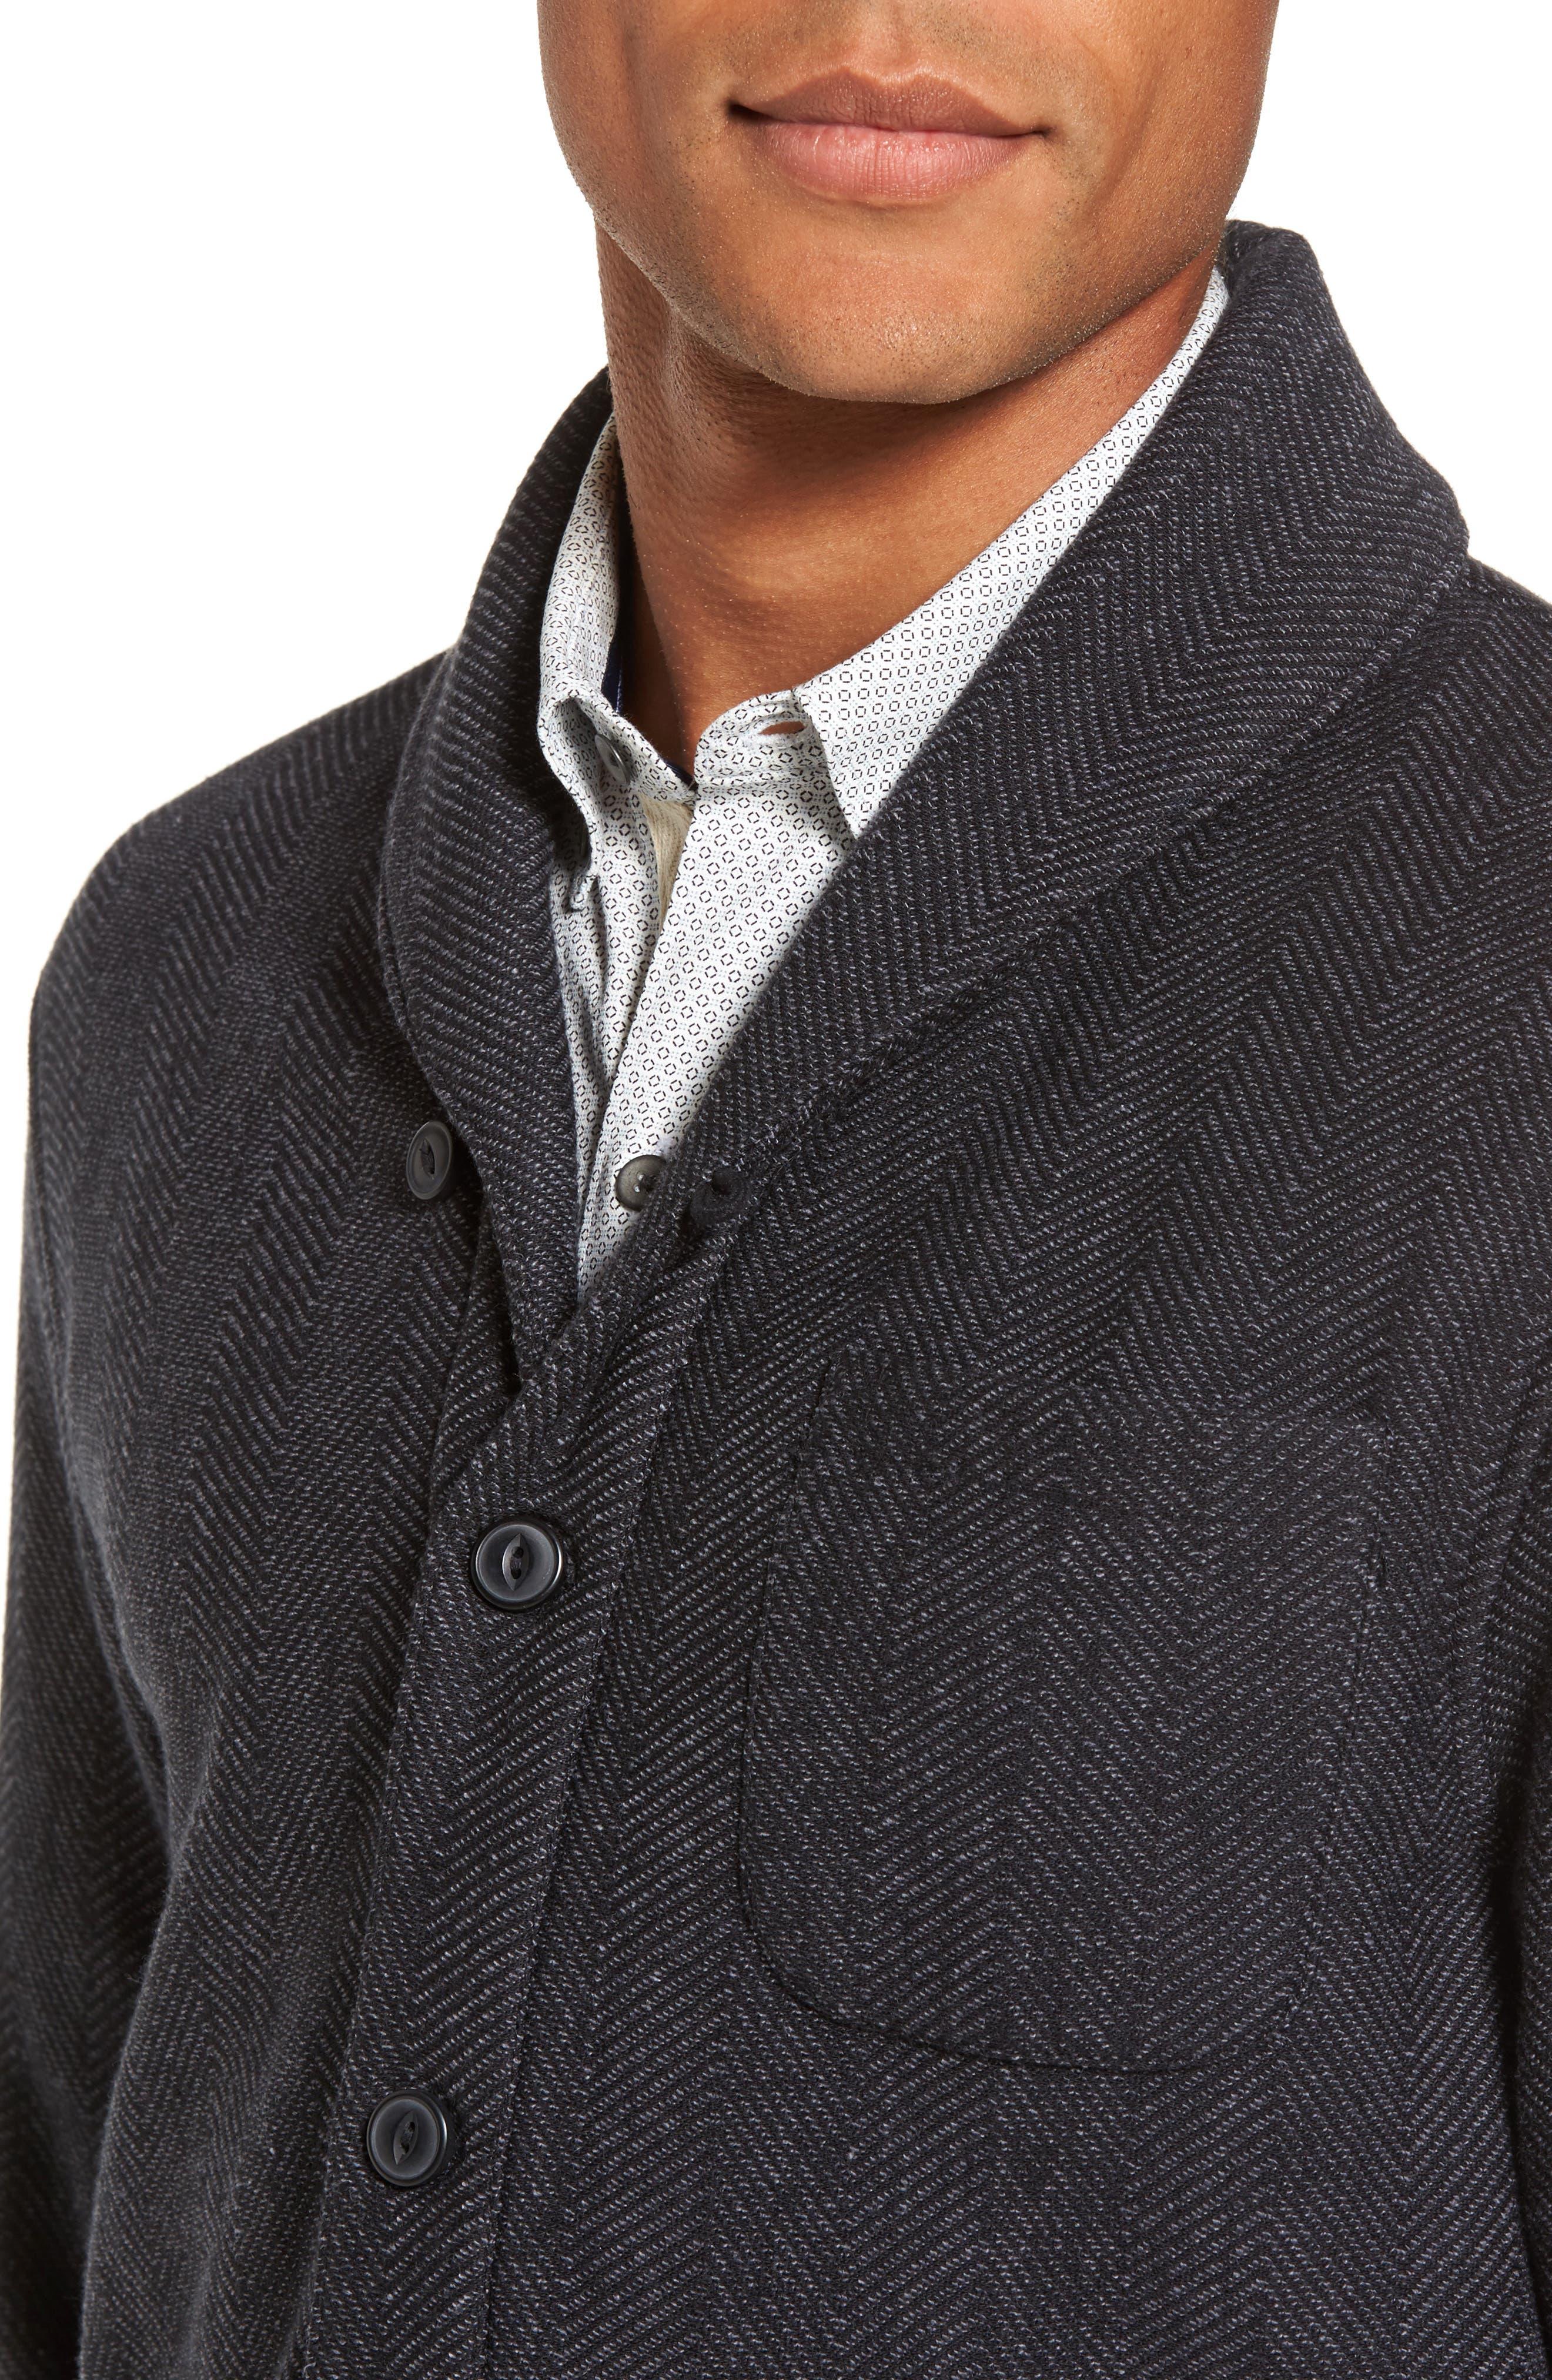 Fleece Lined Shawl Collar Cardigan,                             Alternate thumbnail 4, color,                             021